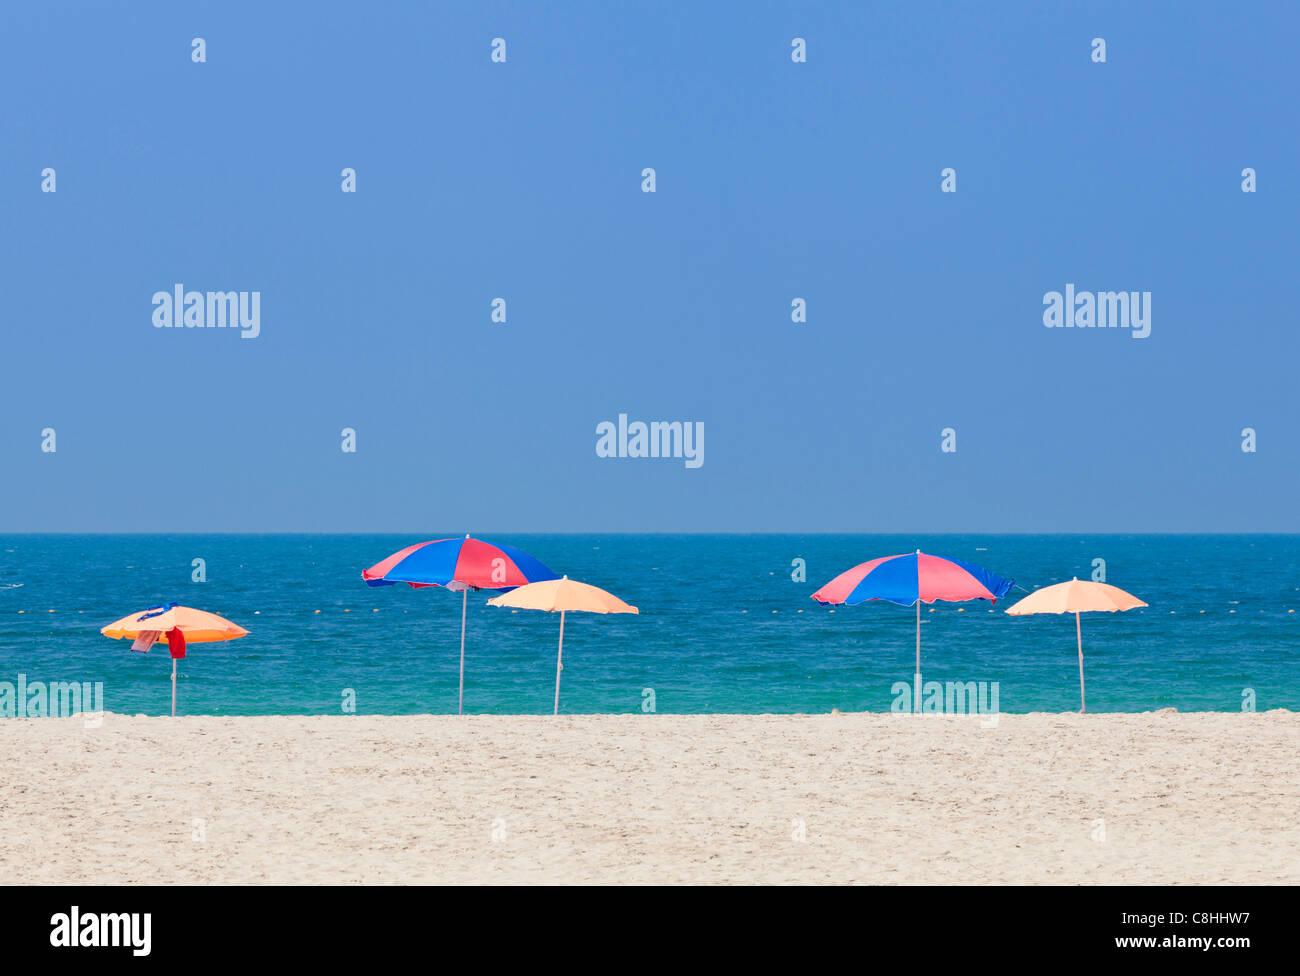 Beach Umbrellas, Jumeirah Russian Beach, Dubai, United Arab Emirates, UAE - Stock Image